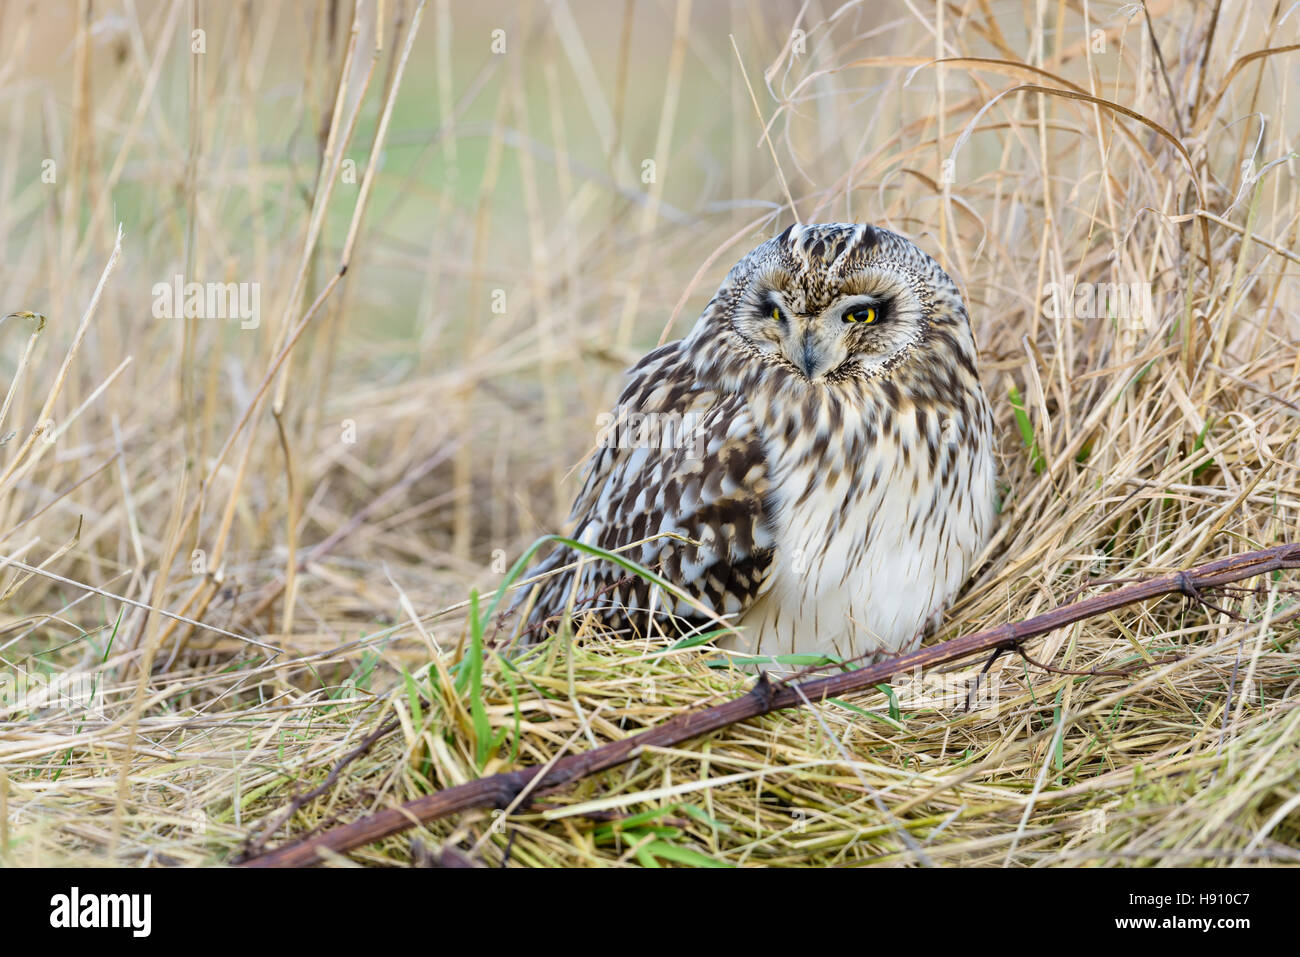 Sumpfohreule, Asio flammeus, Wild Short Eared Owl - Stock Image